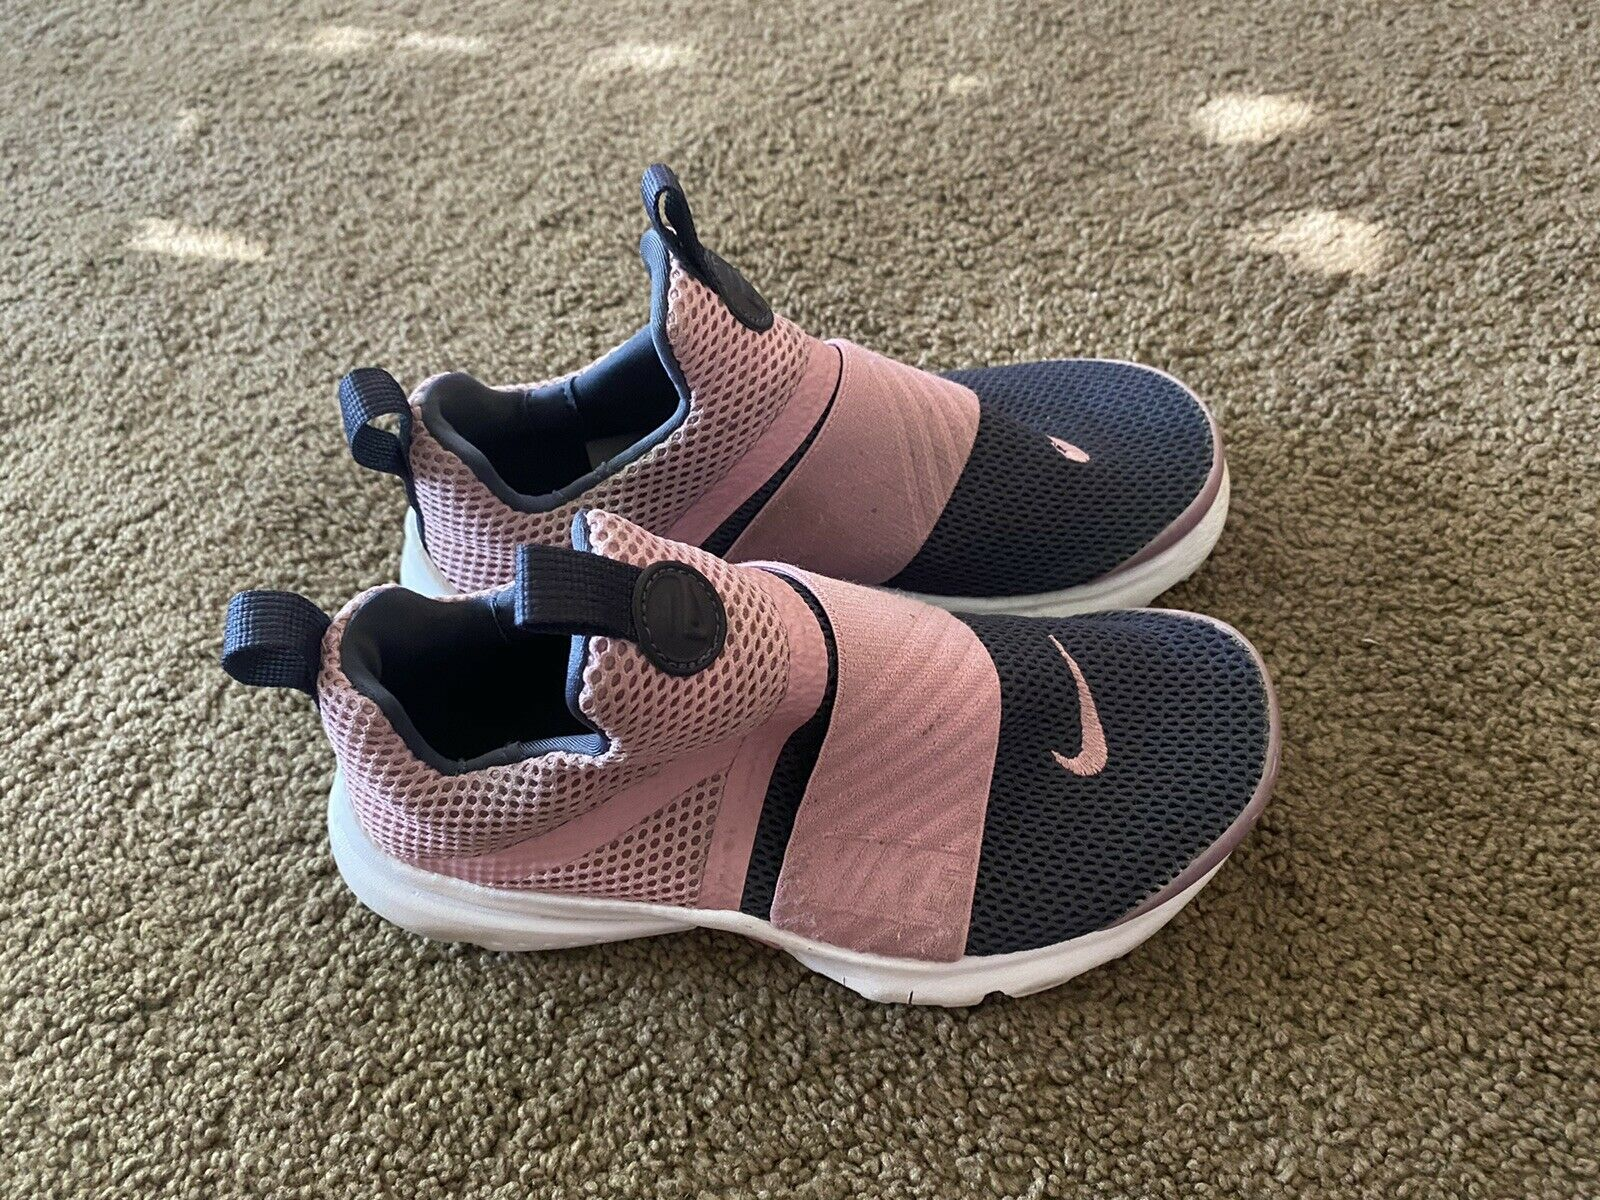 Nike Presto Extreme (GS) Shoes Grey